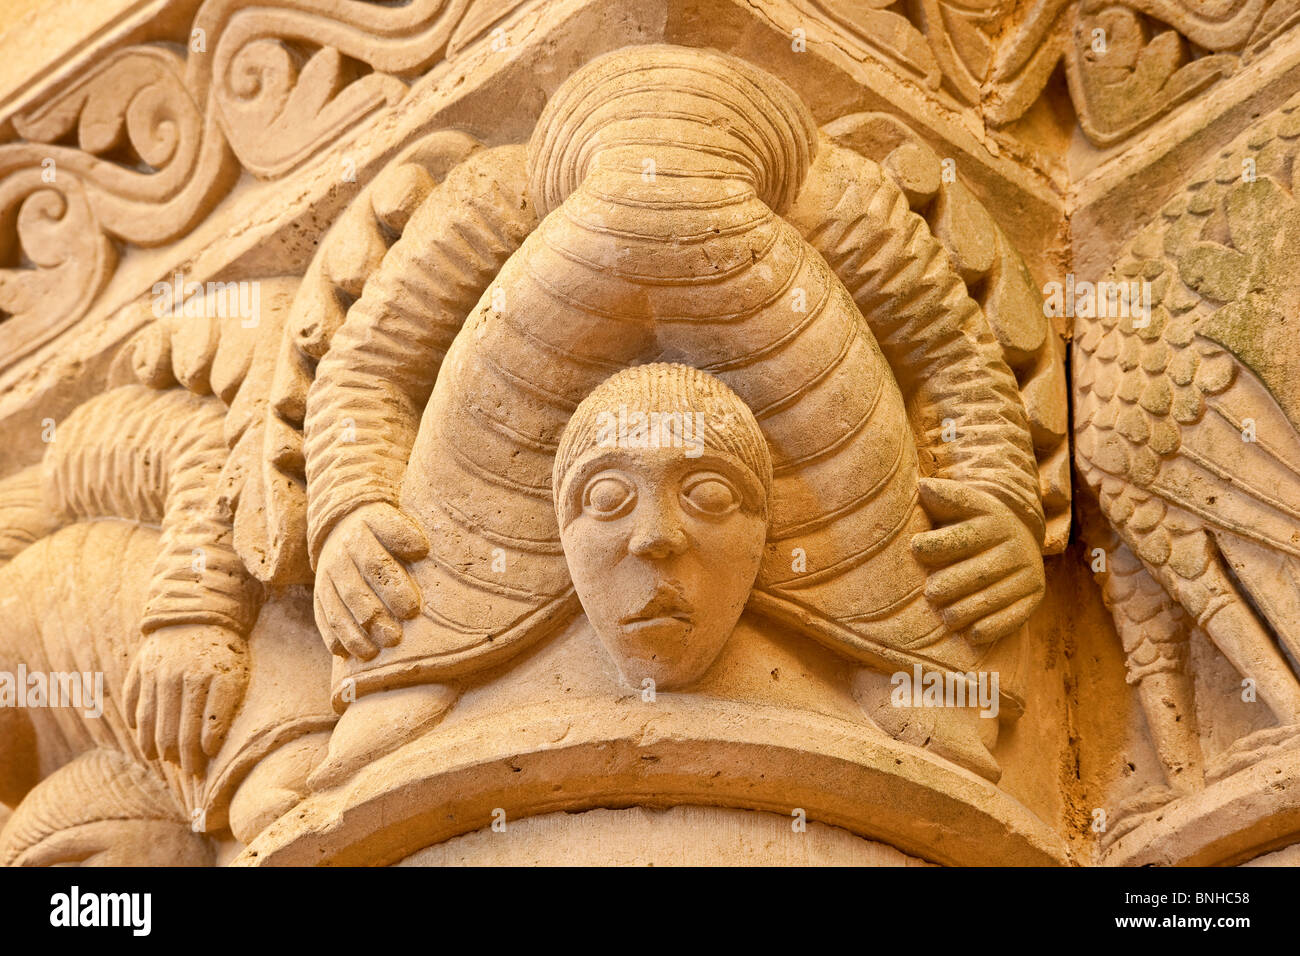 Aulnay de Saintonge, Saint Pierre Church, a stop on the road of Compostela - Stock Image